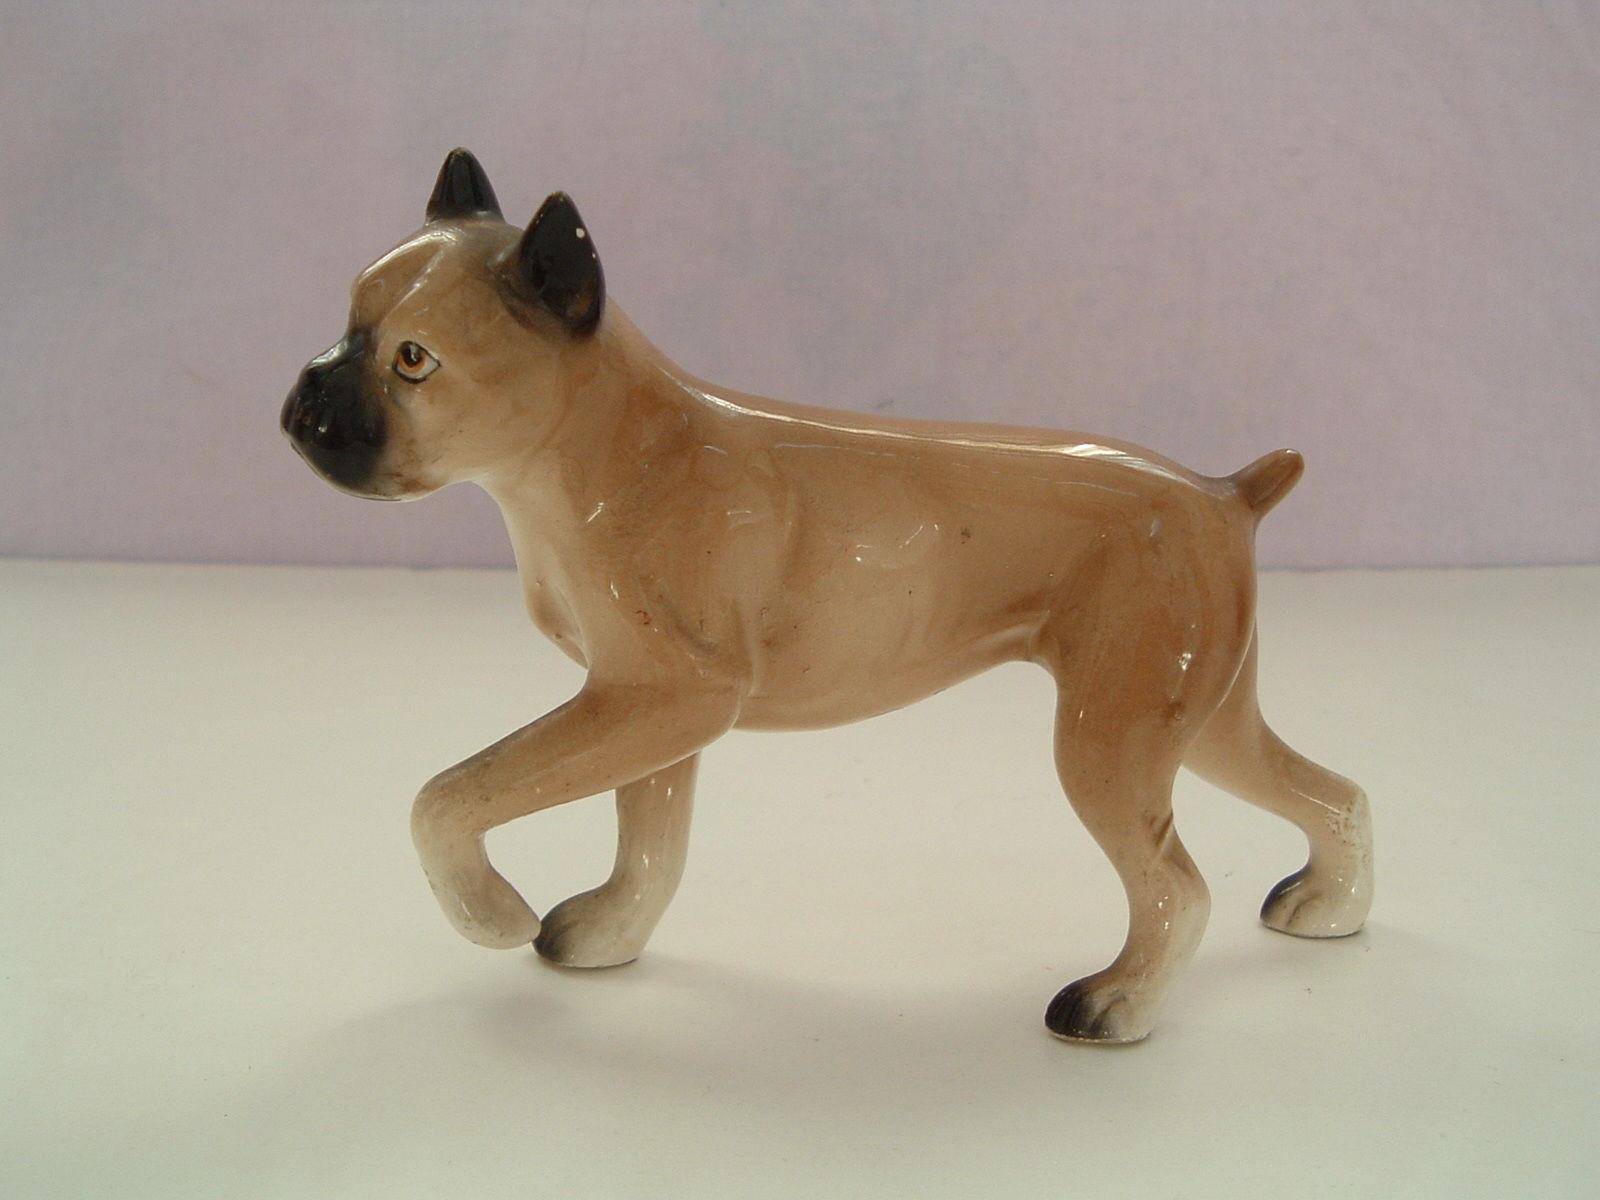 Vintage Nippon Yoko Boeki boxer dog made in Japan - $8.91